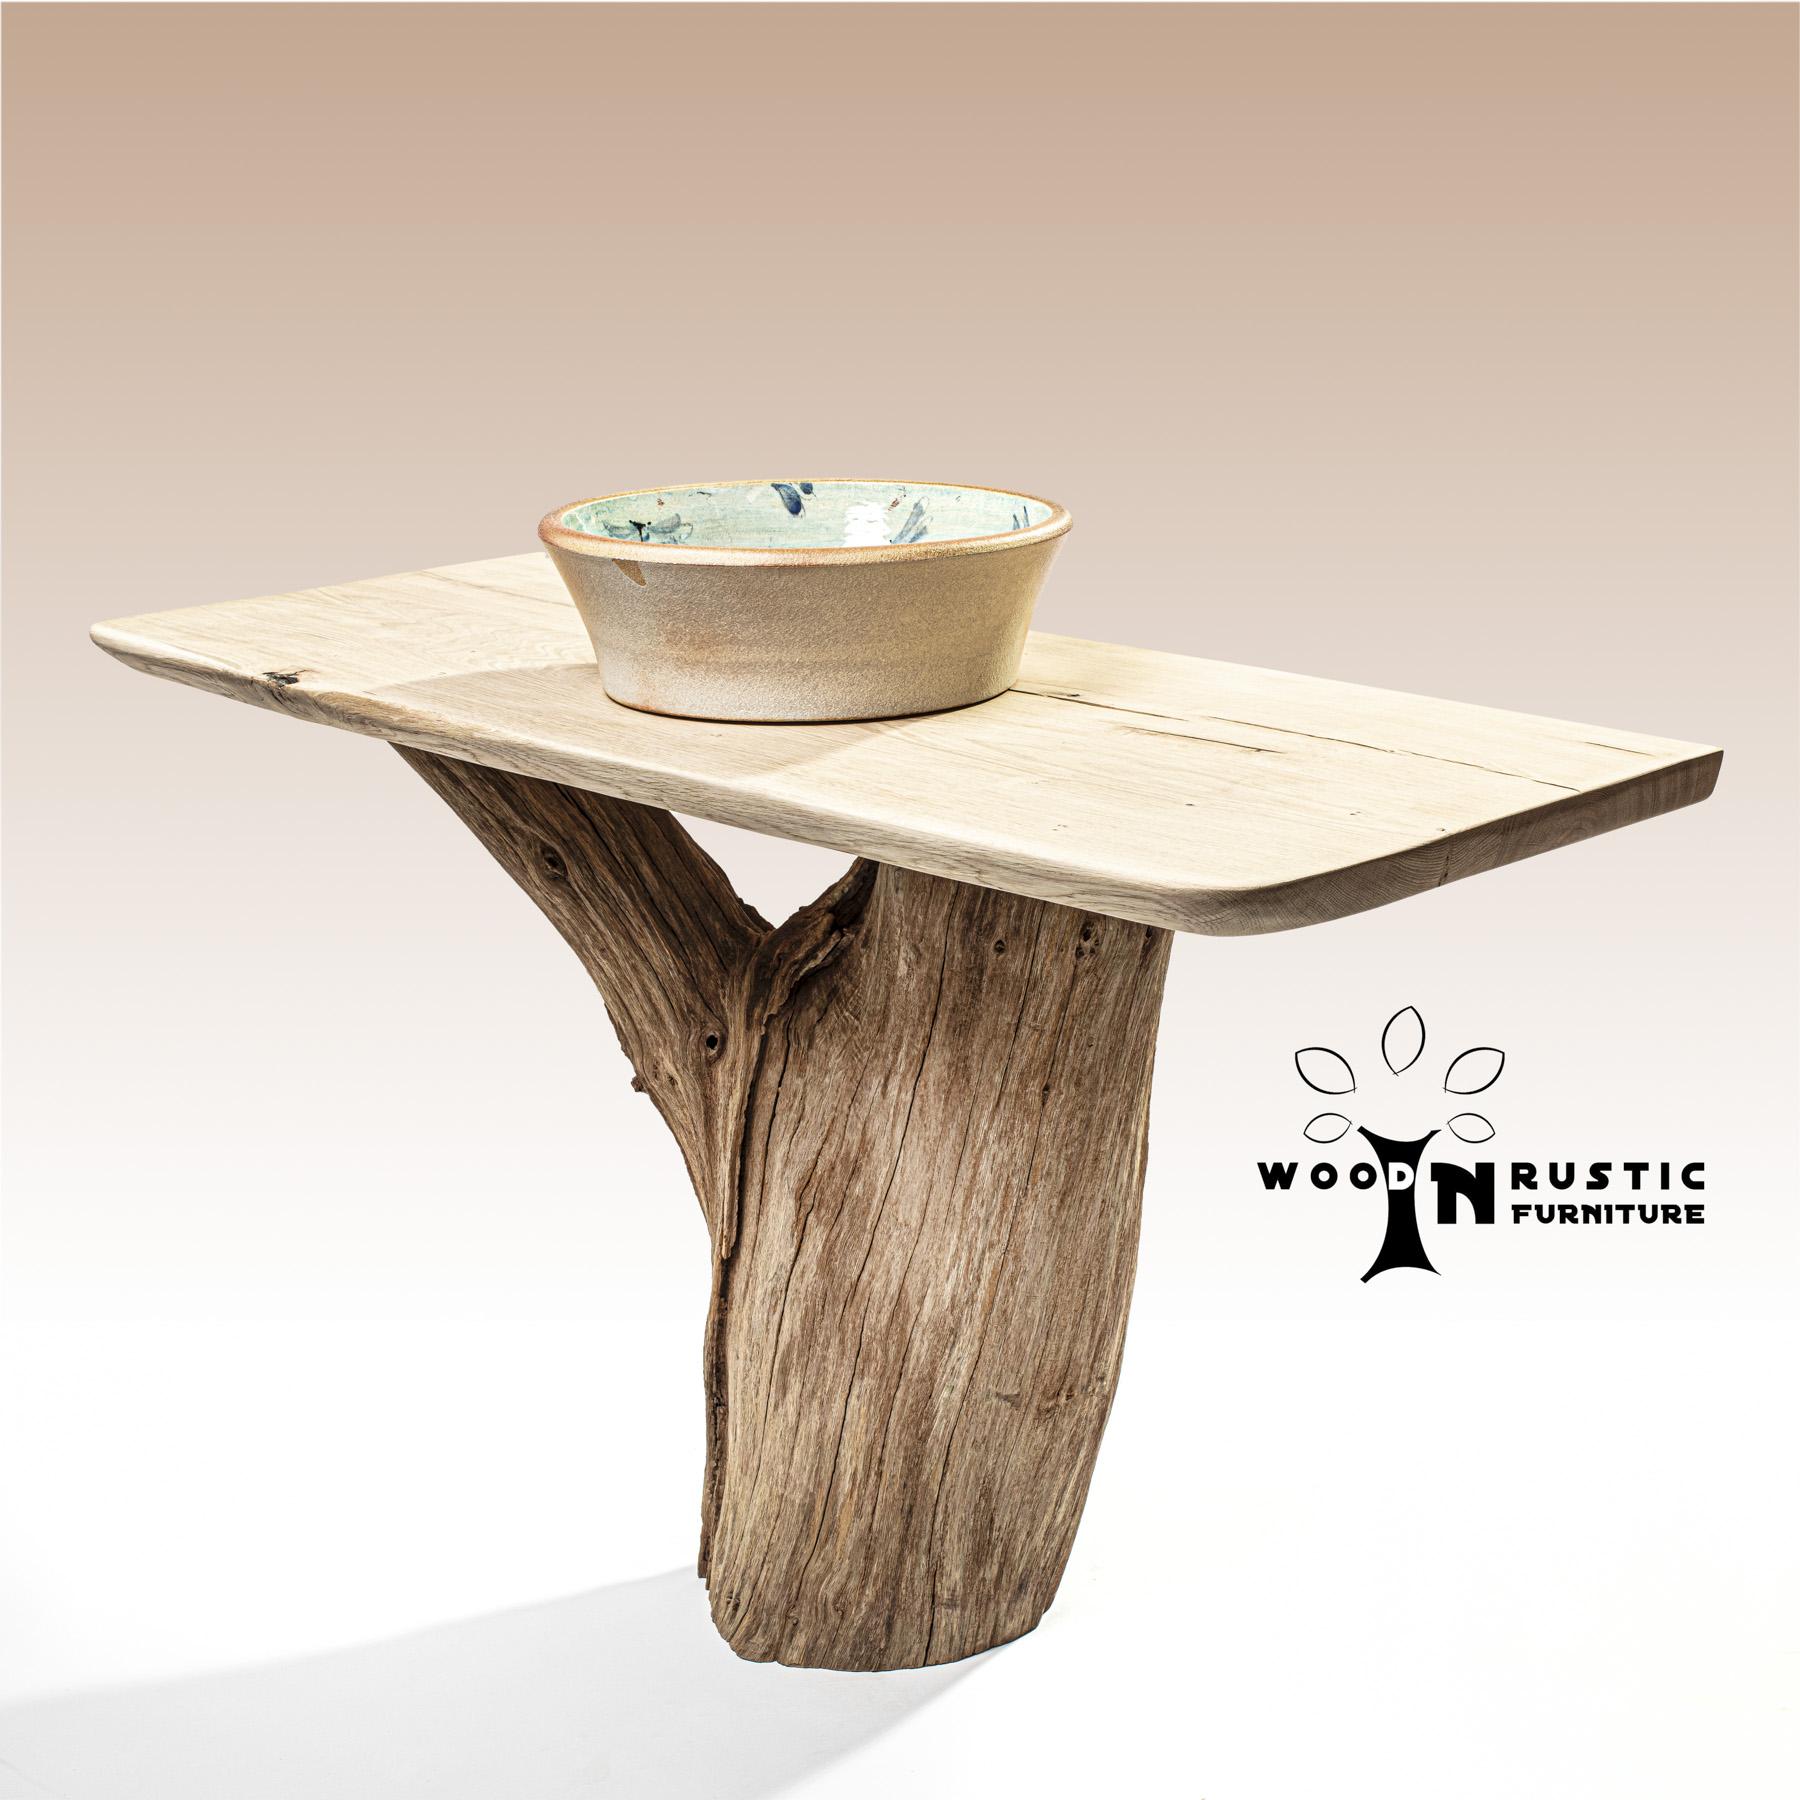 Willkommen Bei Wood N Rustic Furniture Heiduk Hanness Webseite